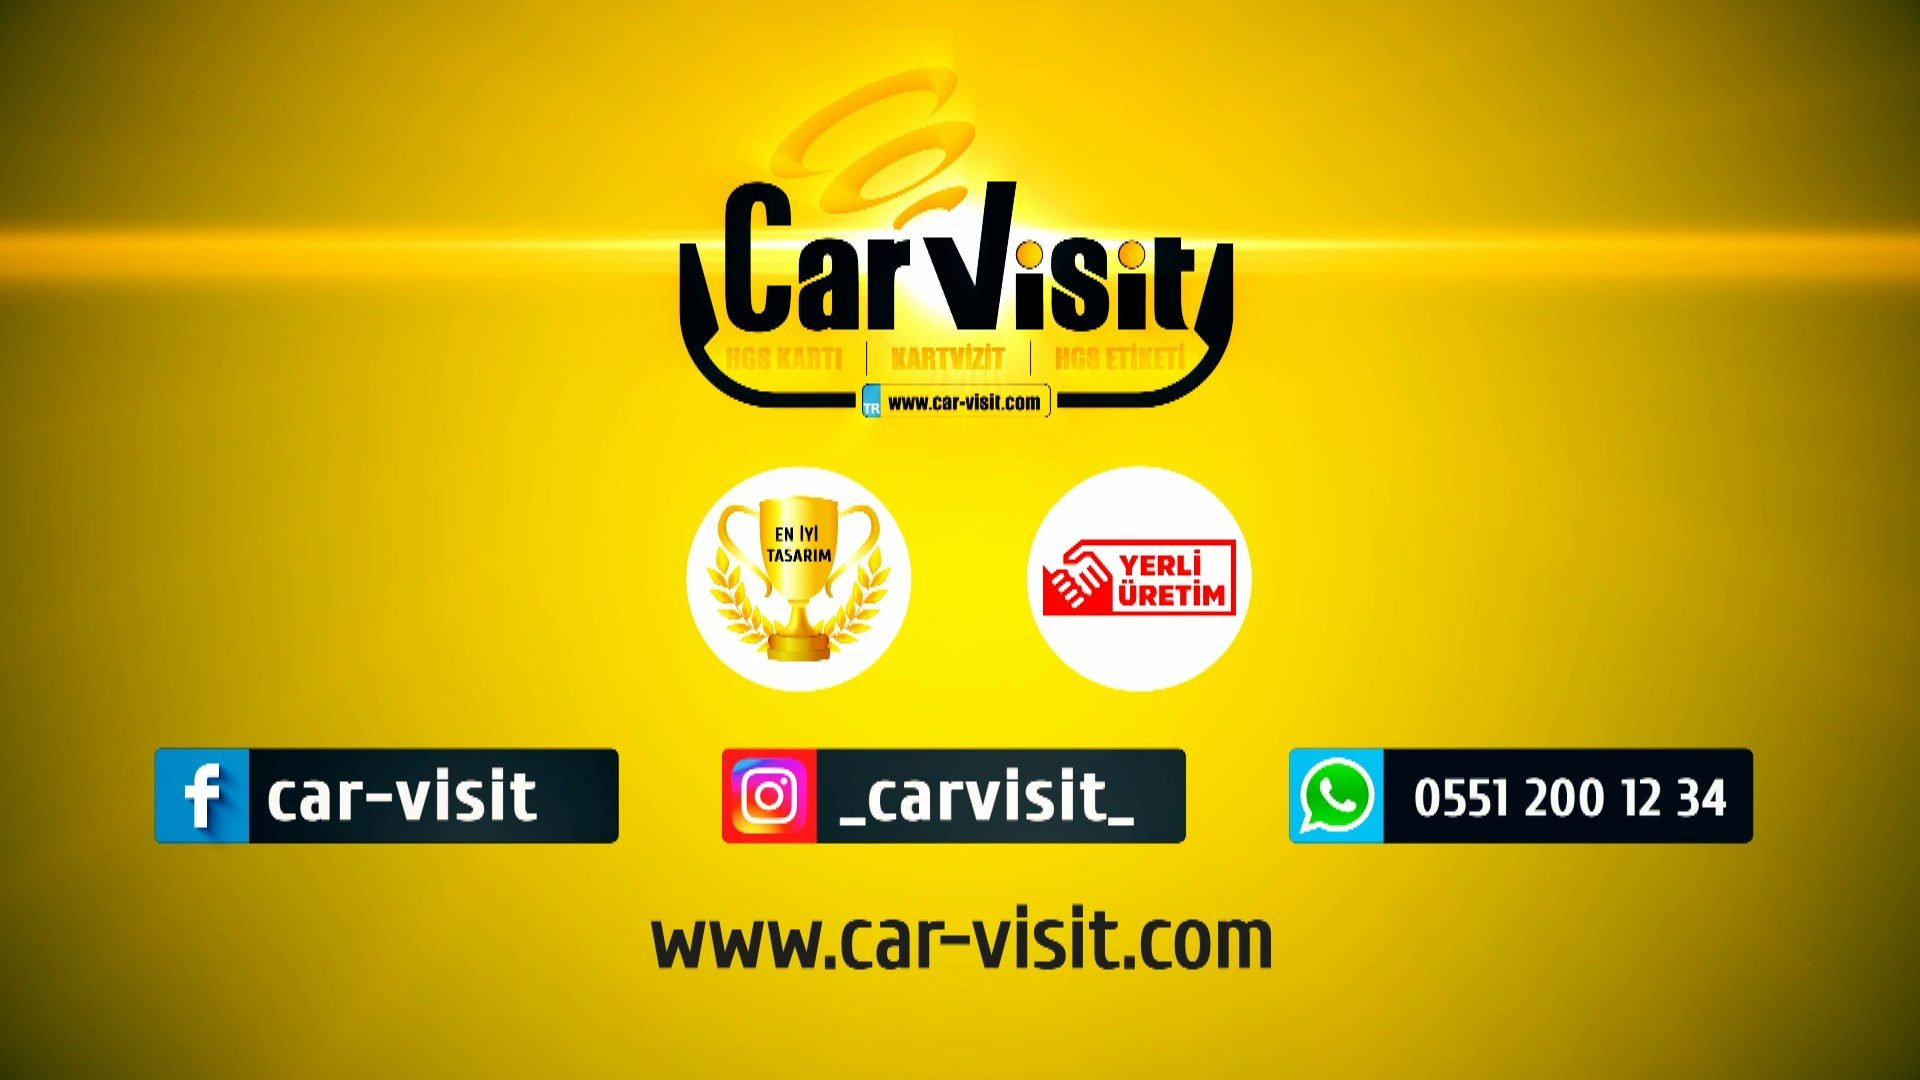 carvisit7 1920x1080 - Car-visit Reklam Filmi